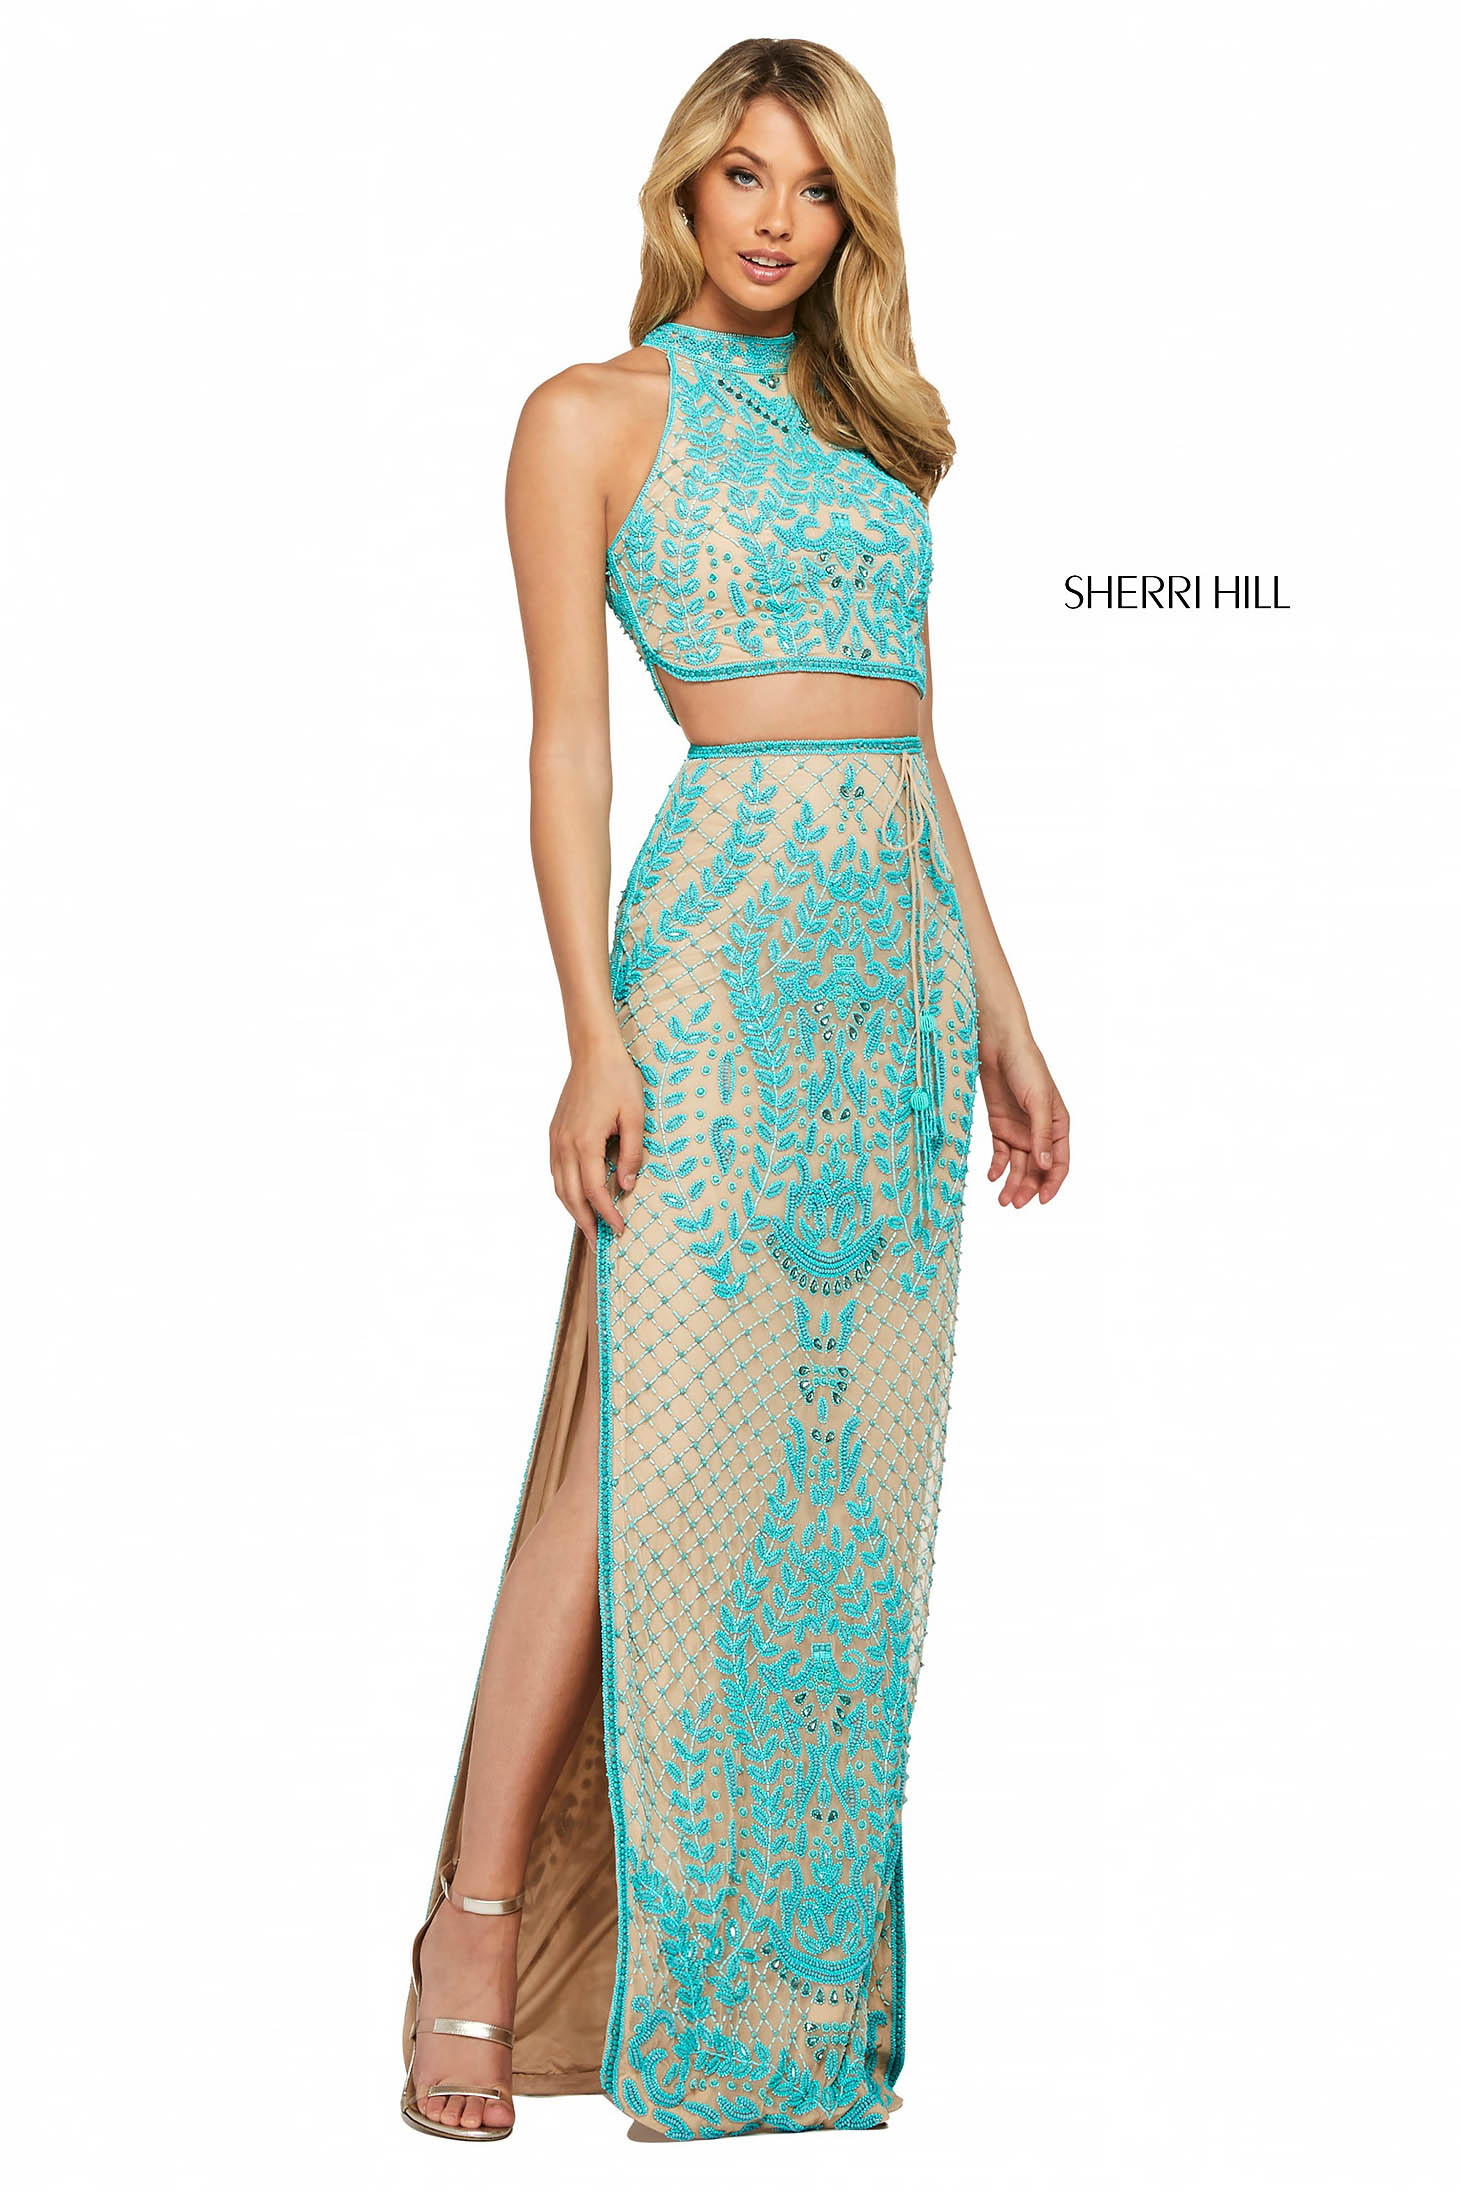 Rochie Sherri Hill 53436 nude/turquoise